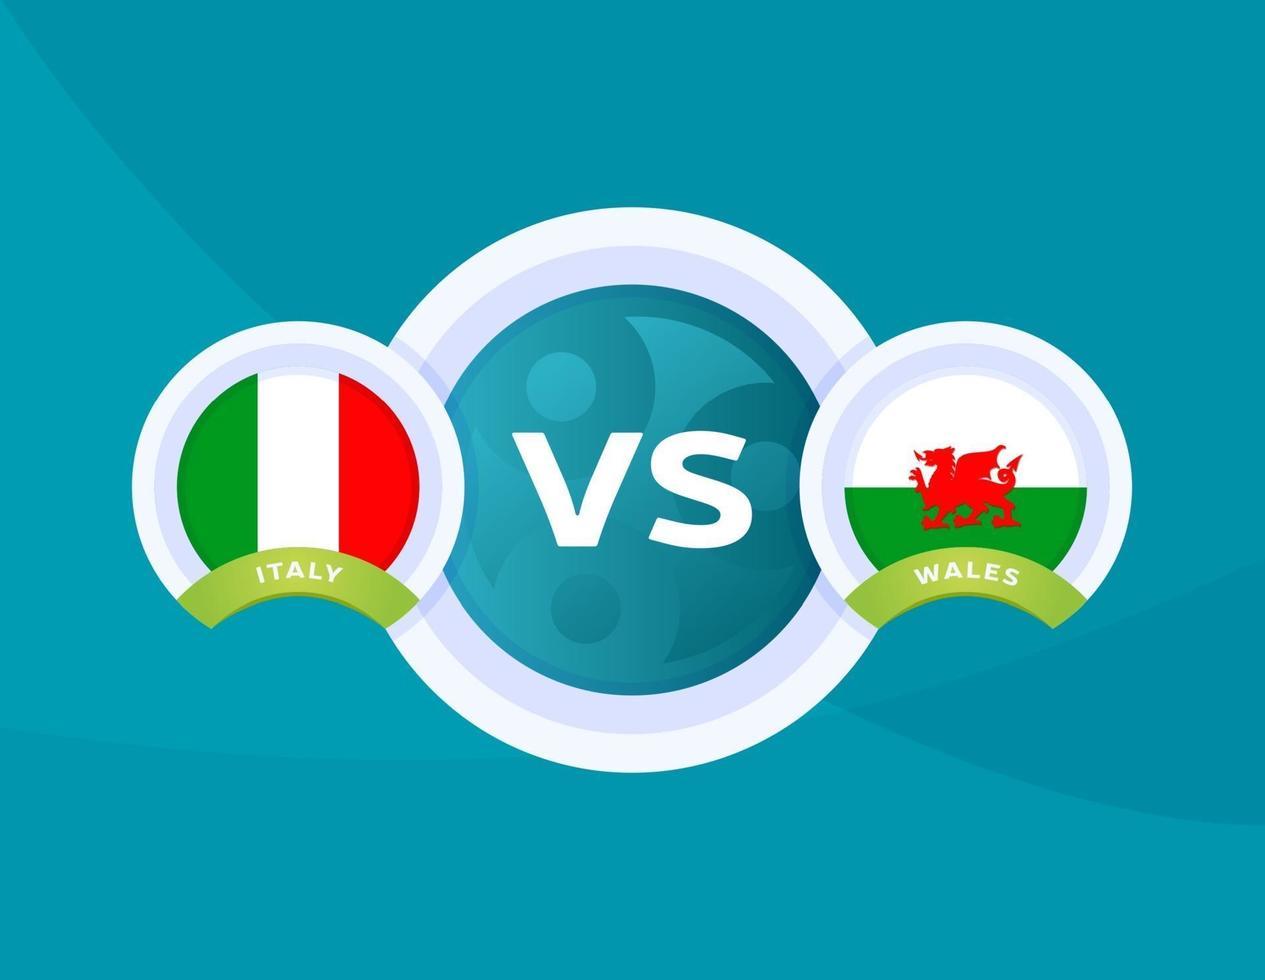 italy vs Wales match 2084706 Vector Art at Vecteezy